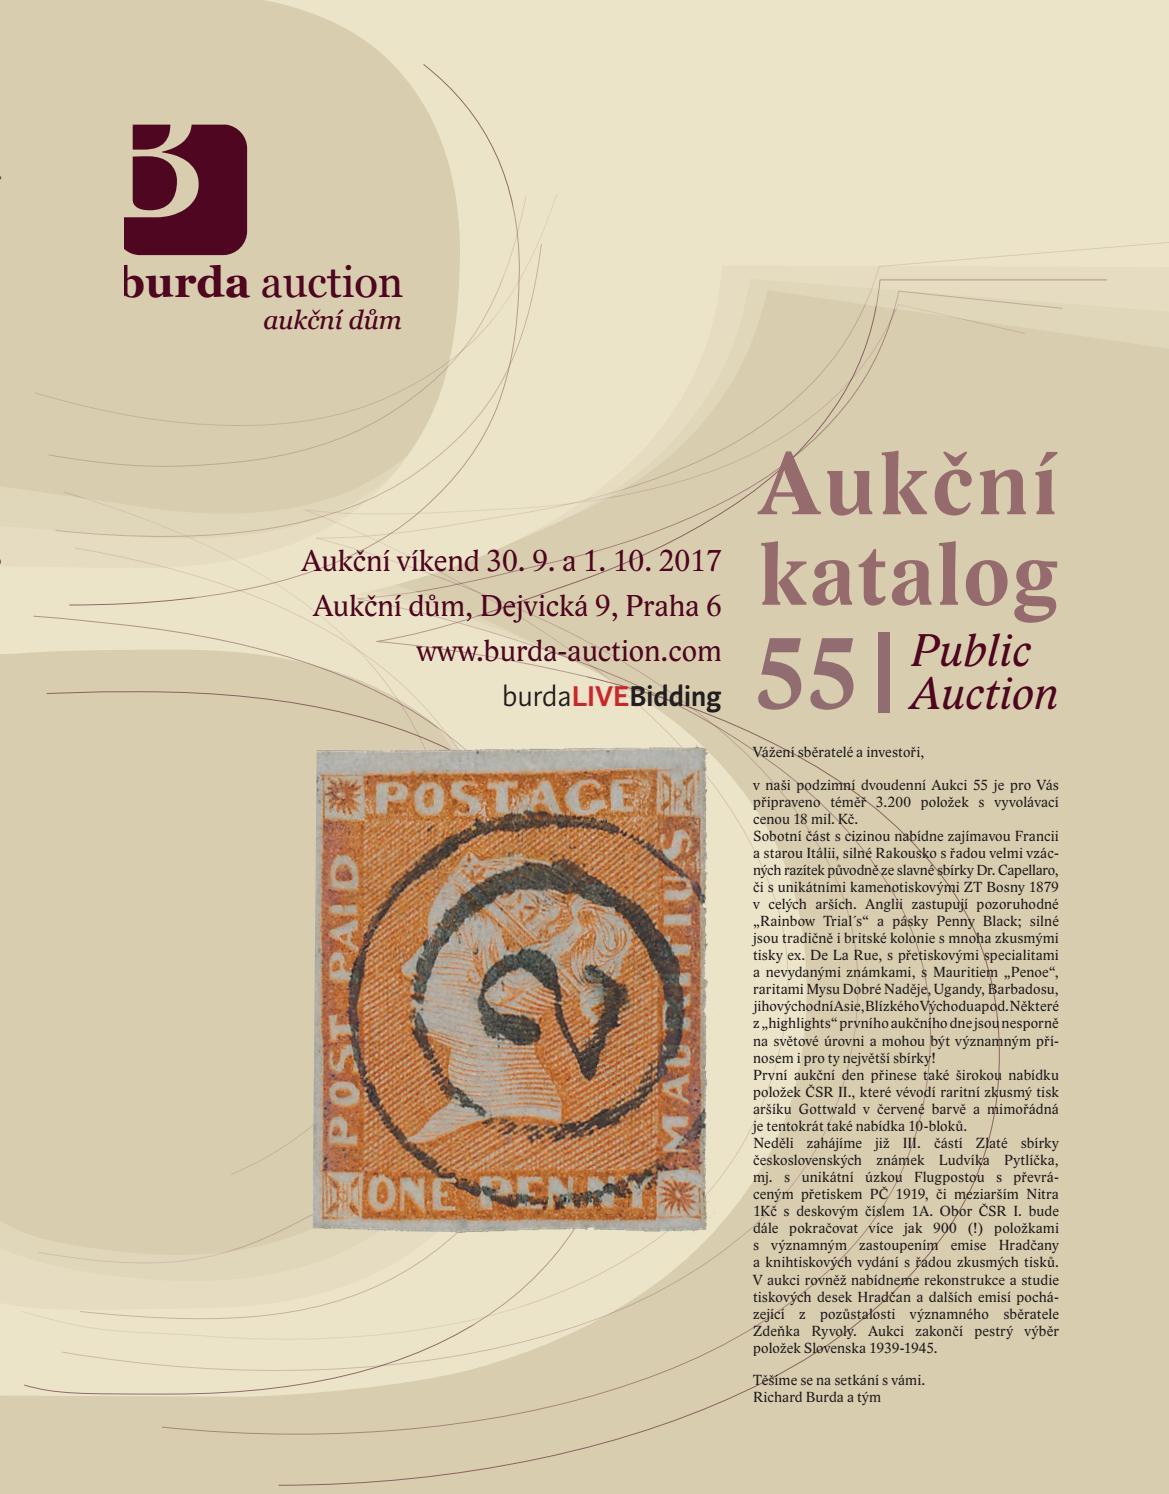 public auction 55 part i by burda auction s r o issuu. Black Bedroom Furniture Sets. Home Design Ideas